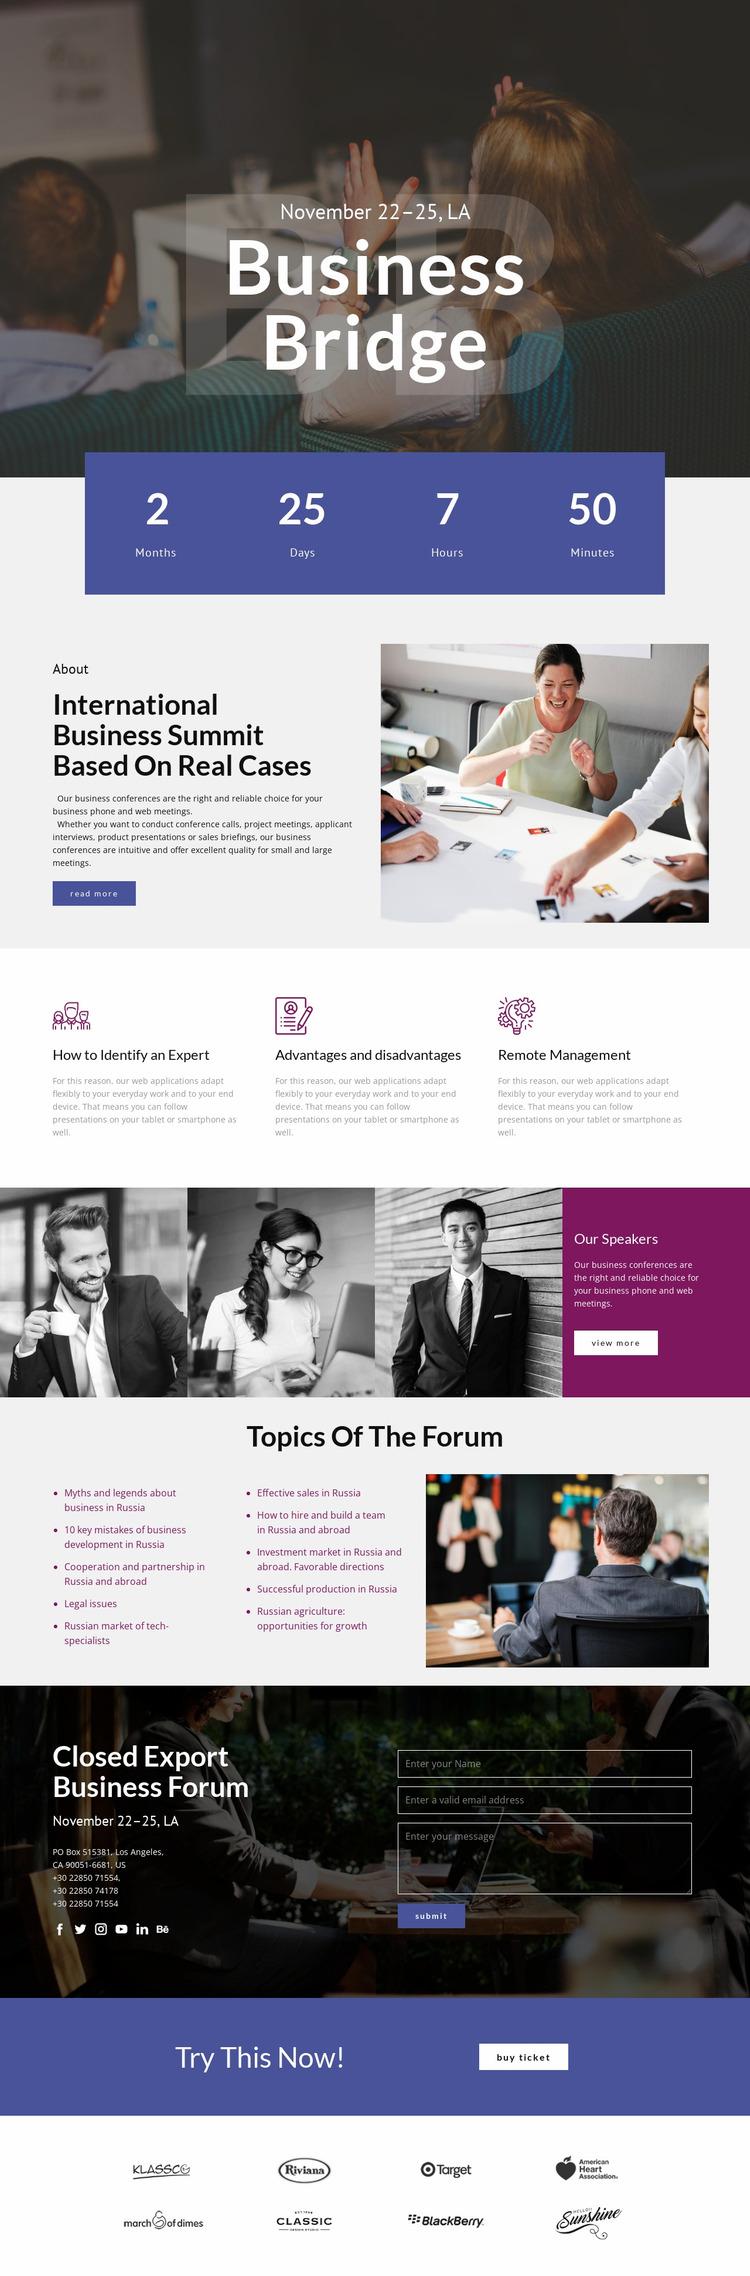 Business Bridge Website Mockup